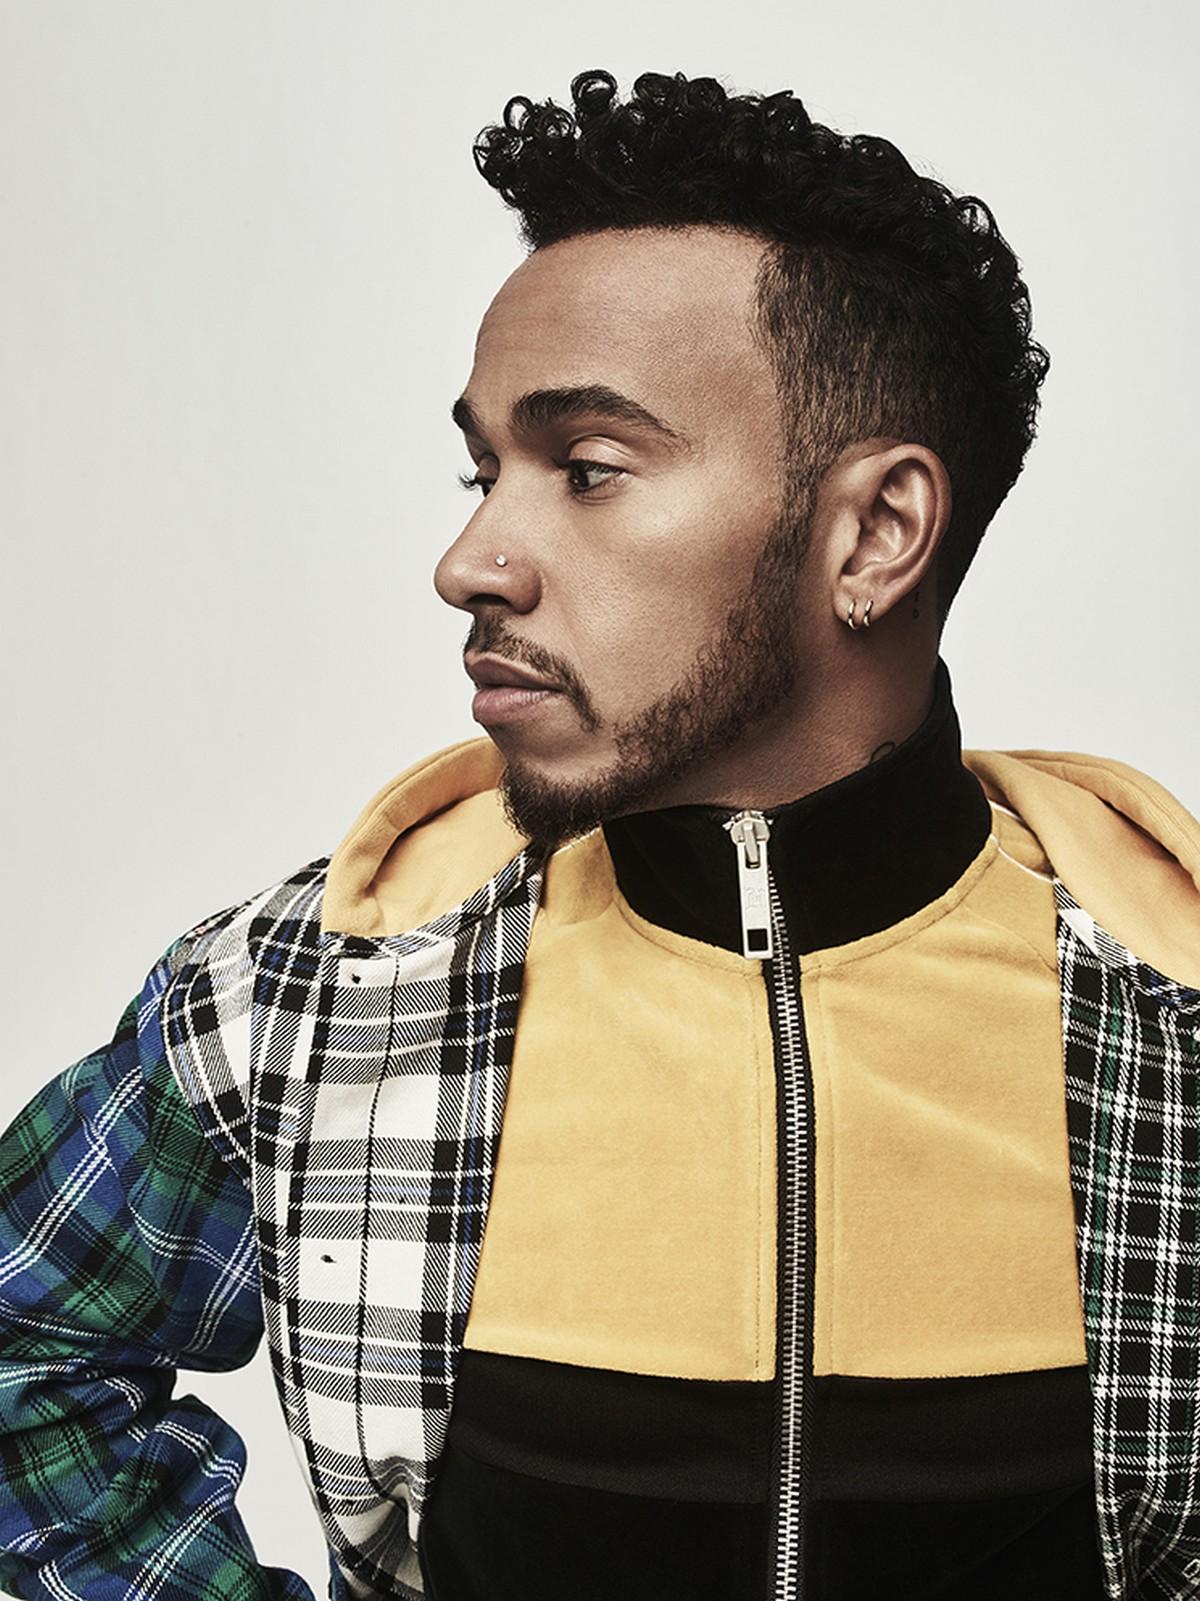 Tommy Hilfiger Lewis Hamilton collezione autunno 2018